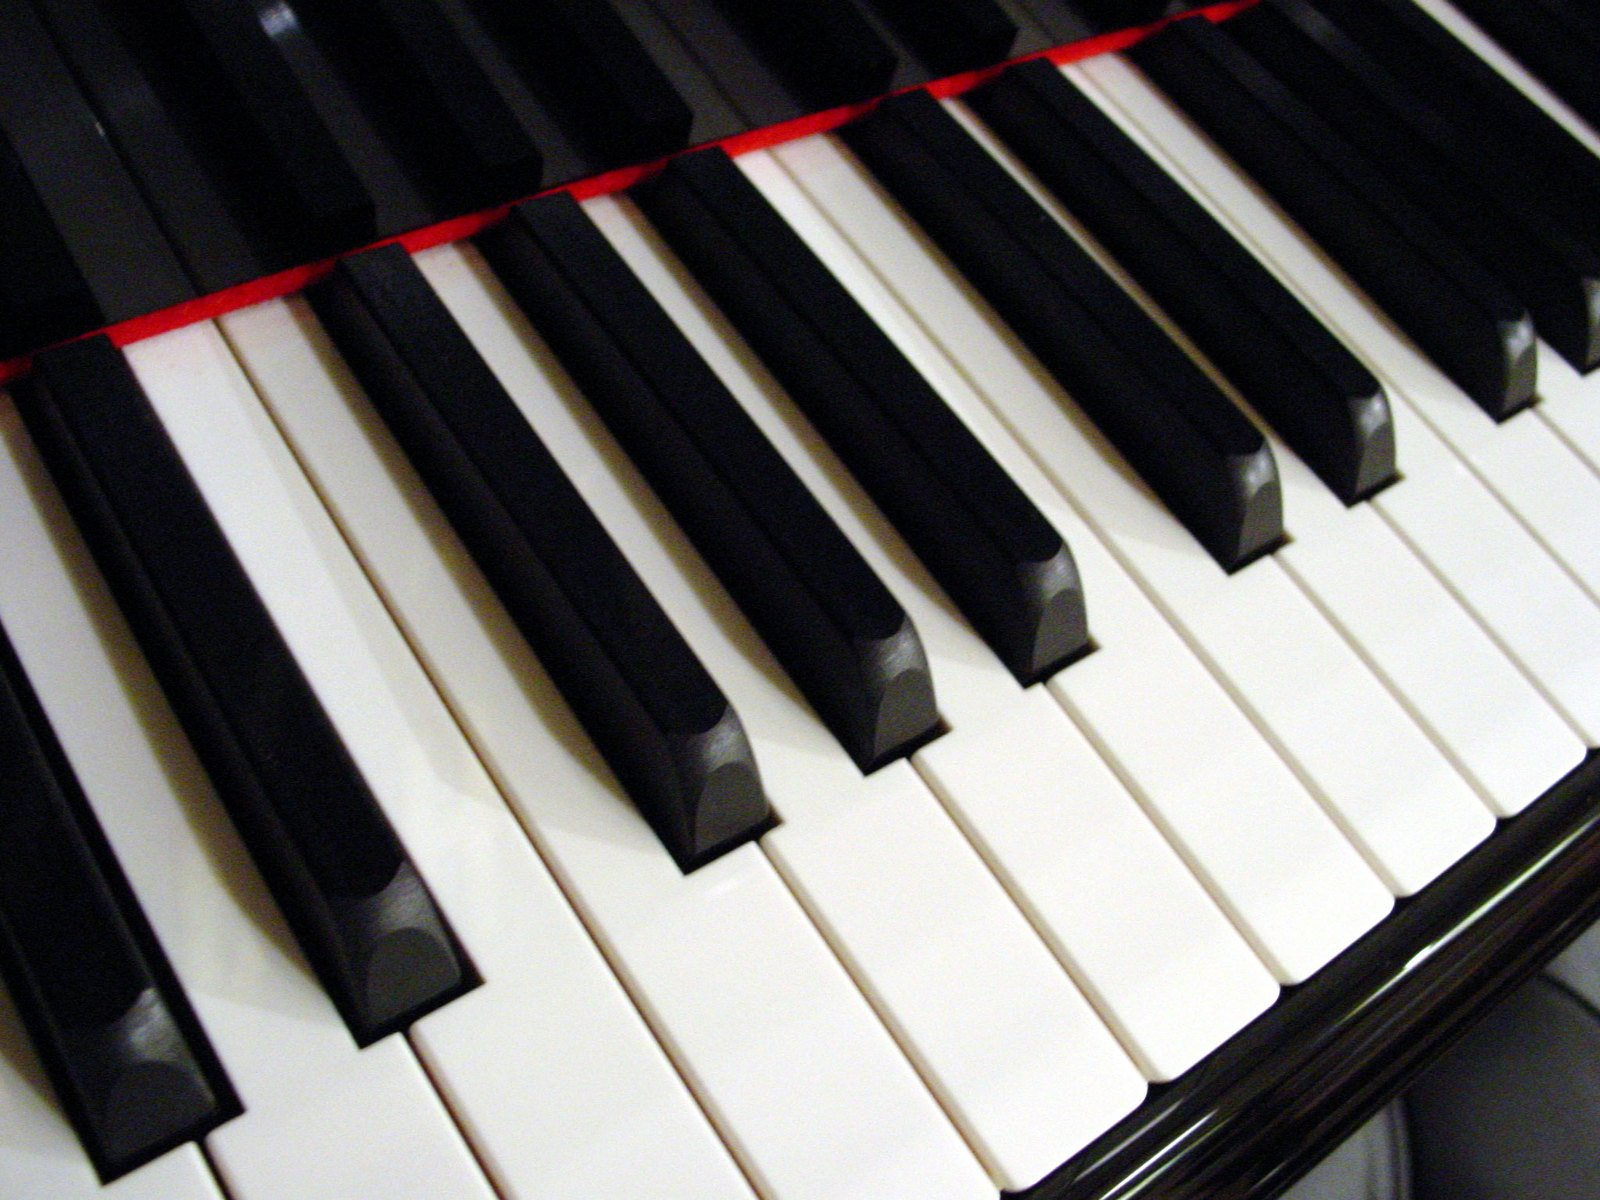 Free Piano Keys Stock Photo - FreeImages com